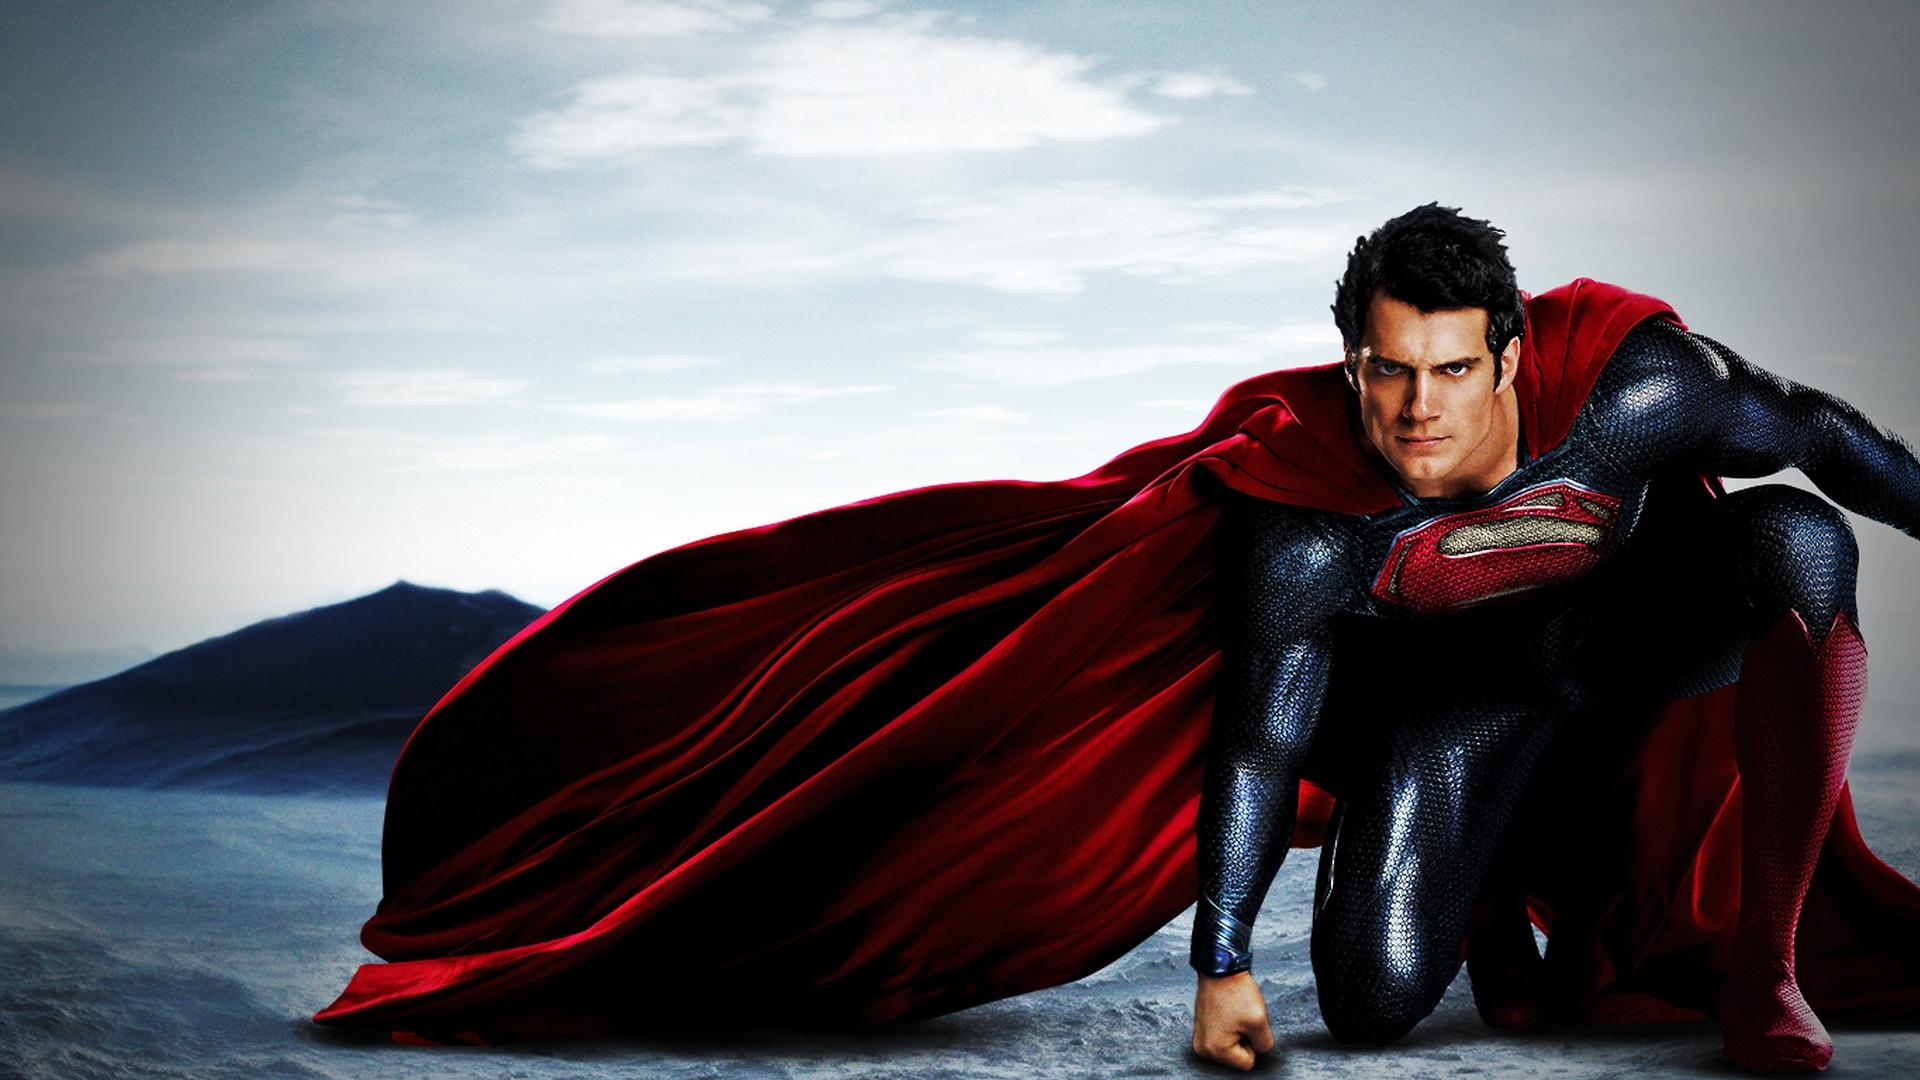 Superman Man of Steel wallpaper 3